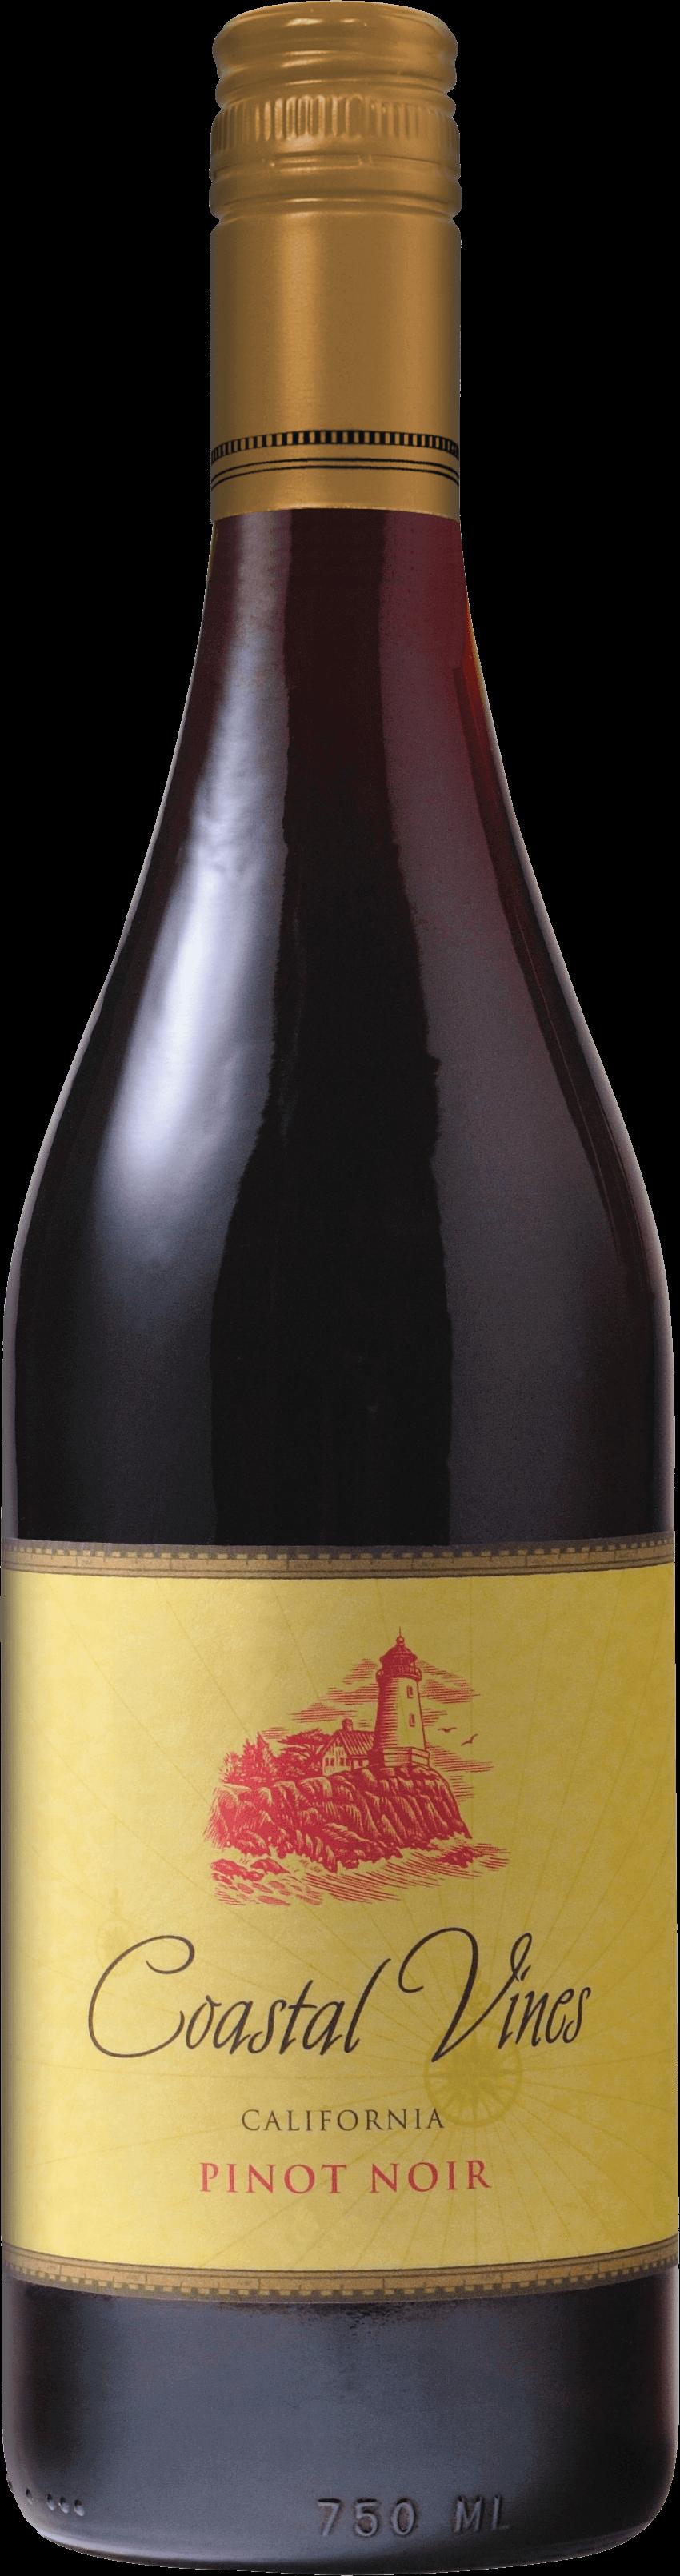 Coastal Vines Pinot Noir Bottleshot